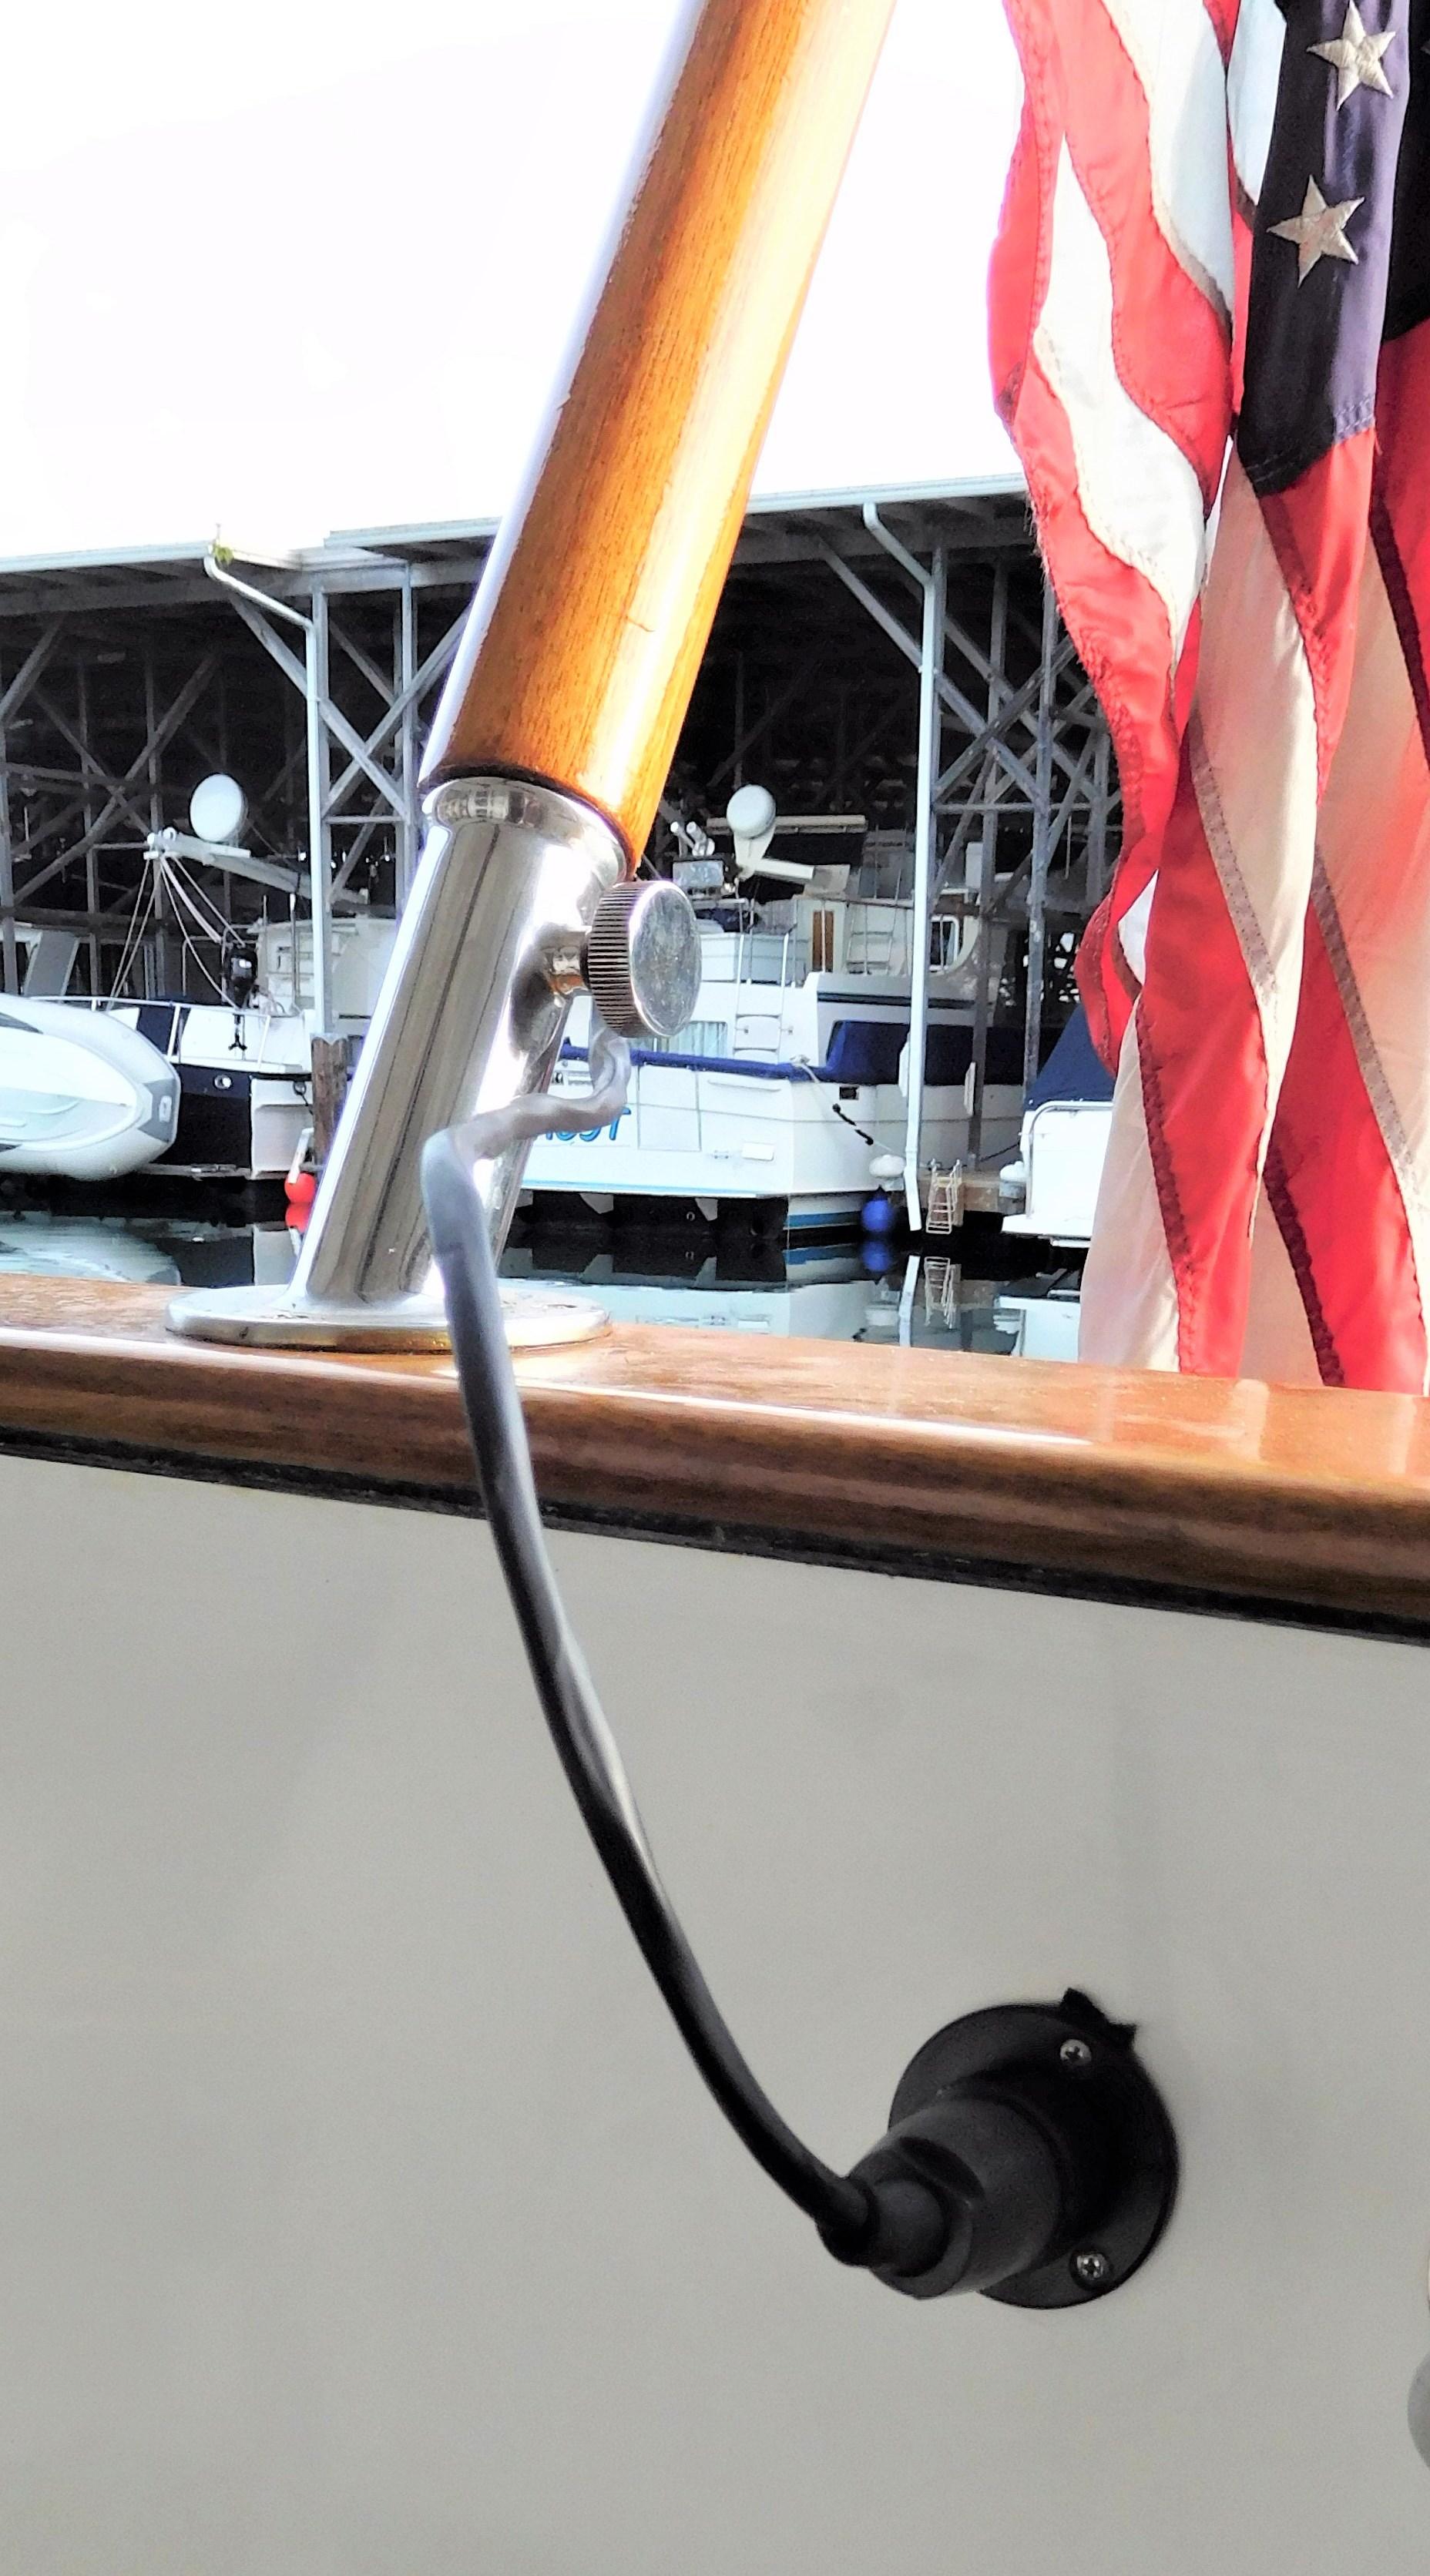 Backup camera for boaters - Waggoner Cruising Guide